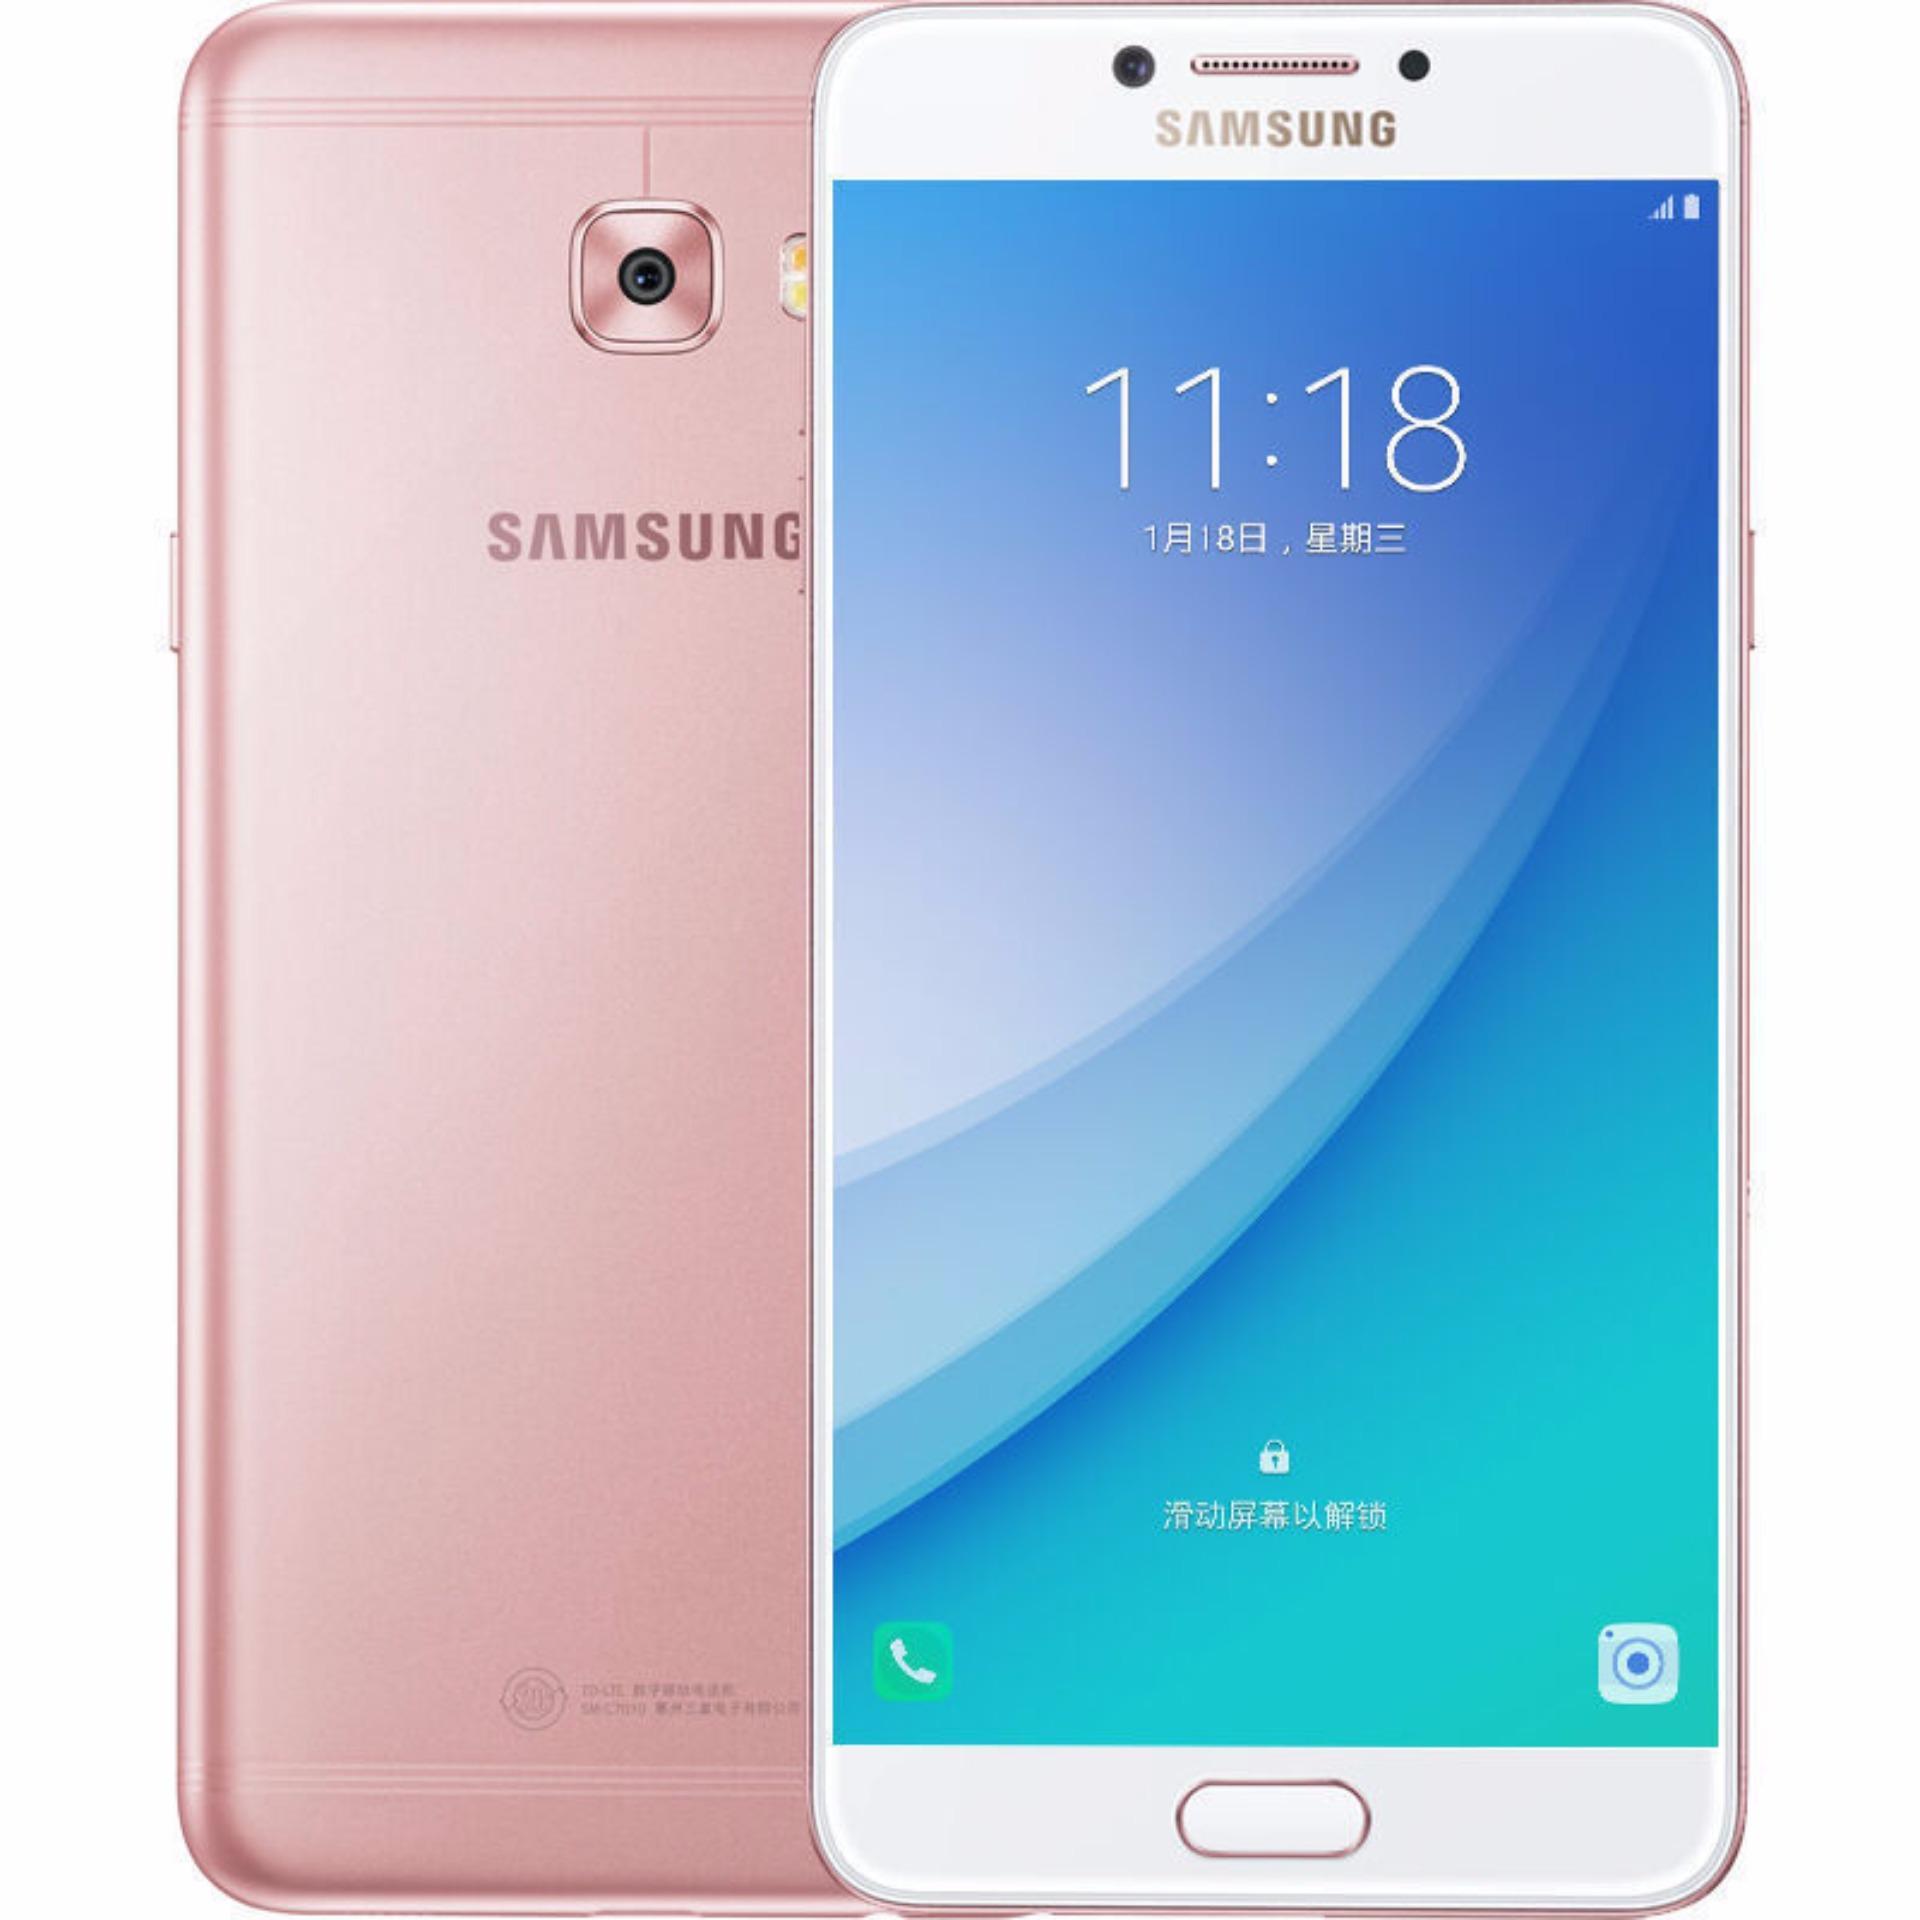 Terbaik Murah Samsung Galaxy C7 Pro 64gb Ram 4gb New 100 S6 Edge Plus G9287c Original